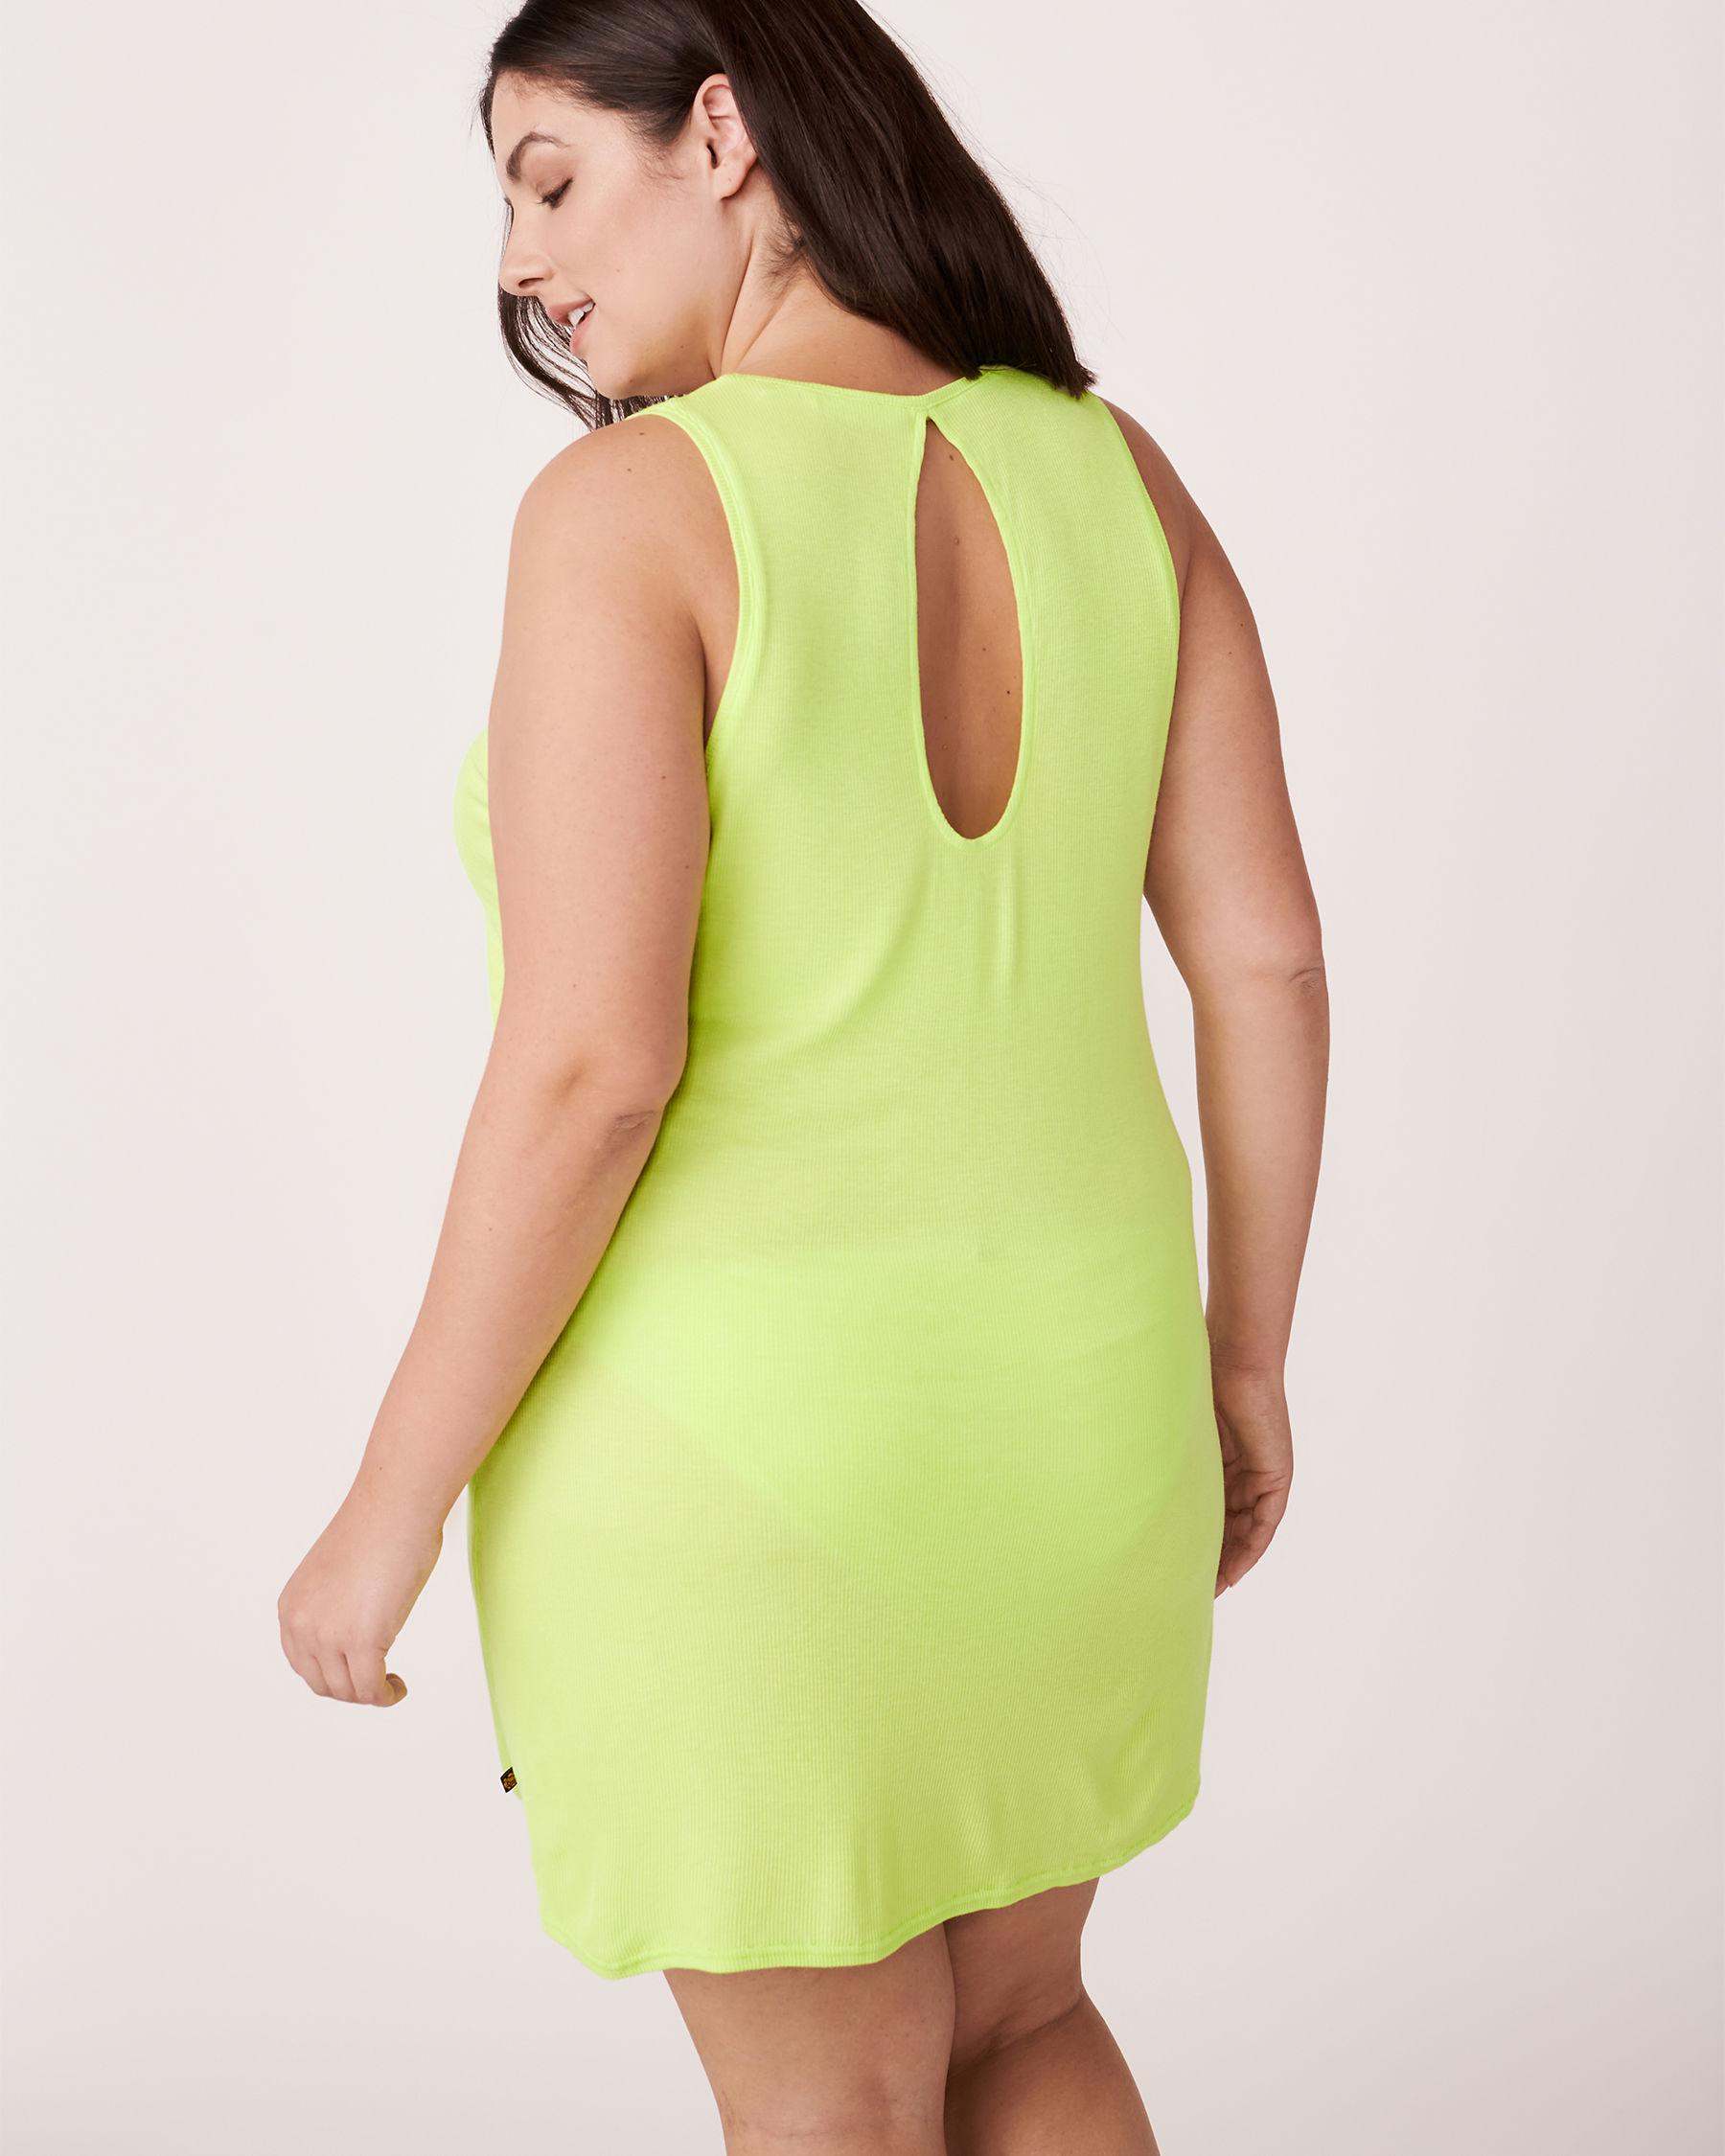 LA VIE EN ROSE AQUA Knotted Sleeveless Dress Lime 80400002 - View2